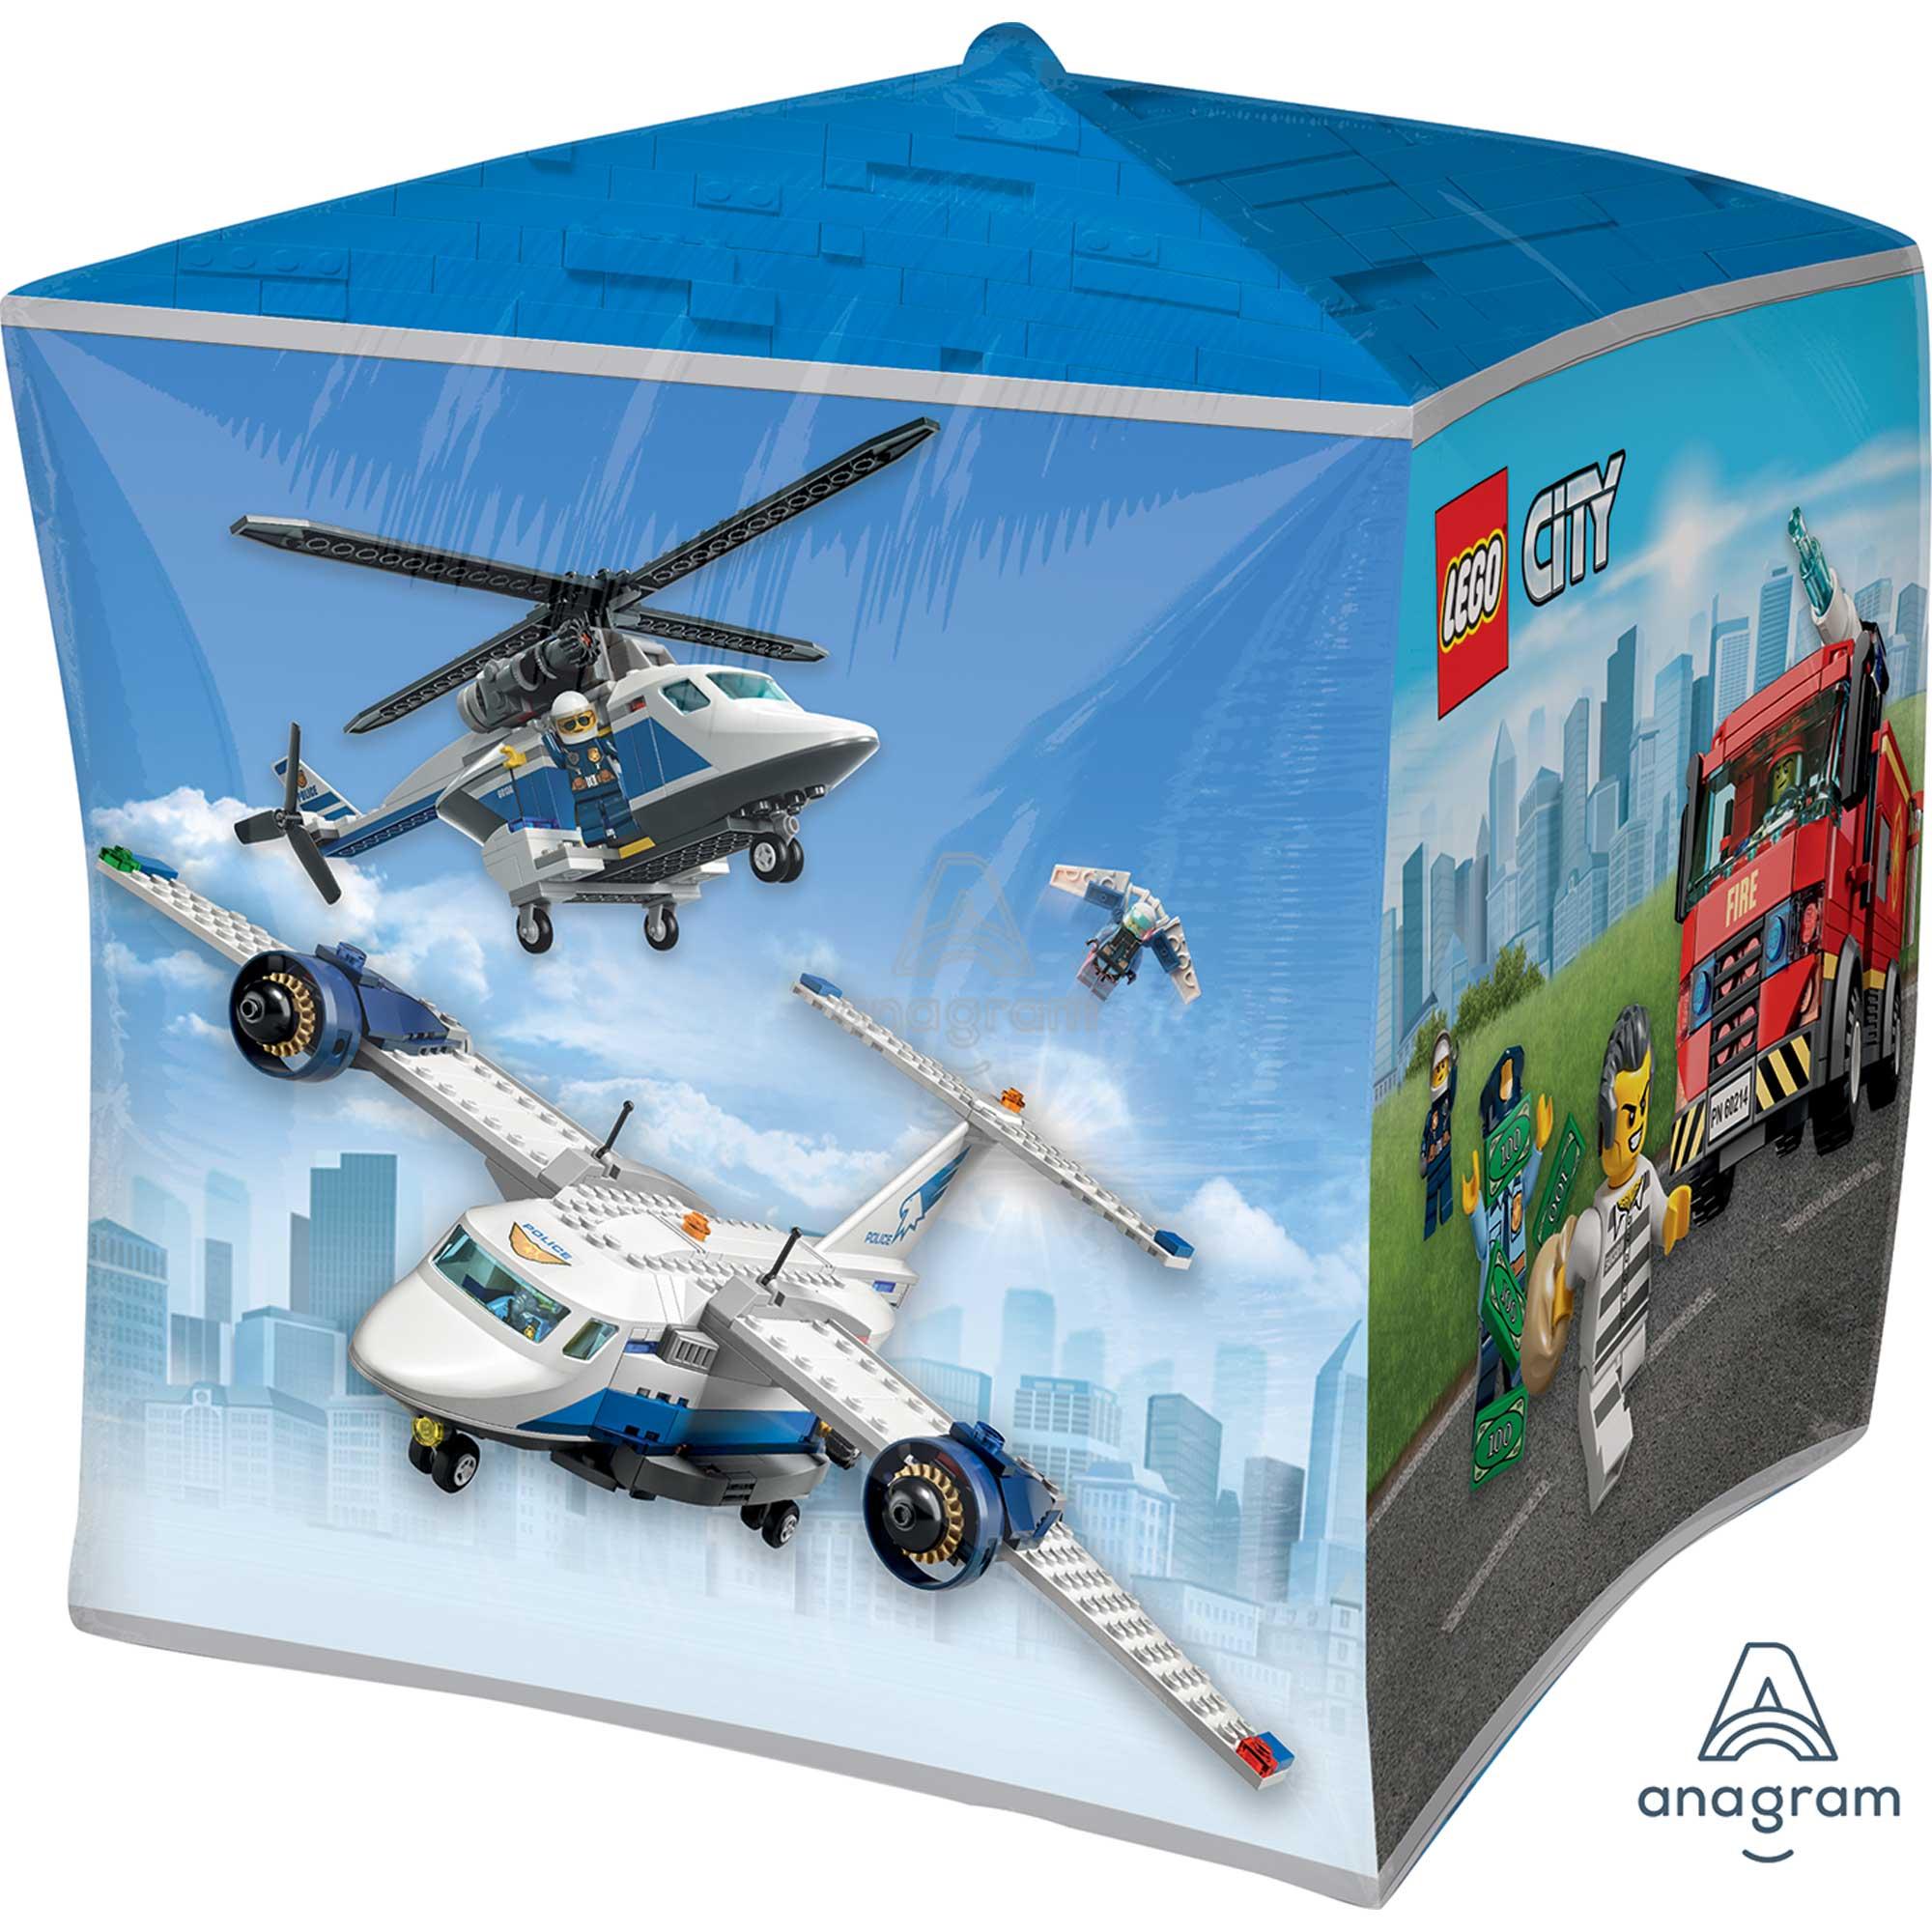 UltraShape Cubez Lego City G40